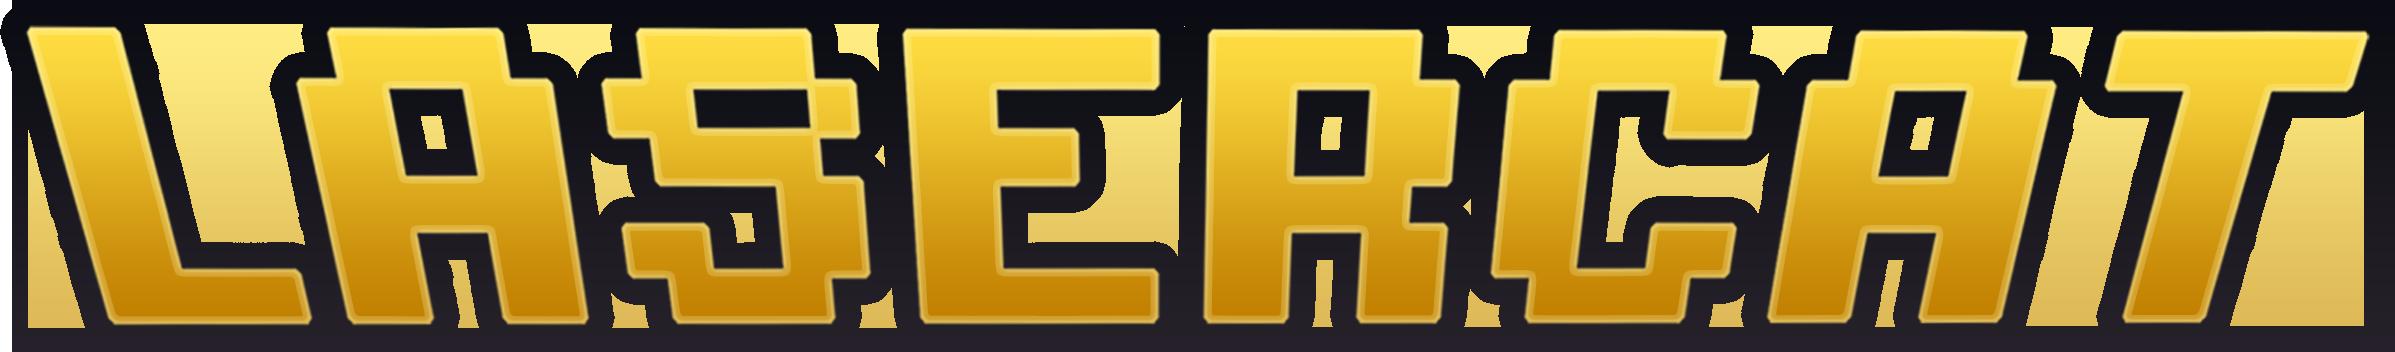 LaserCat-TitleOnly